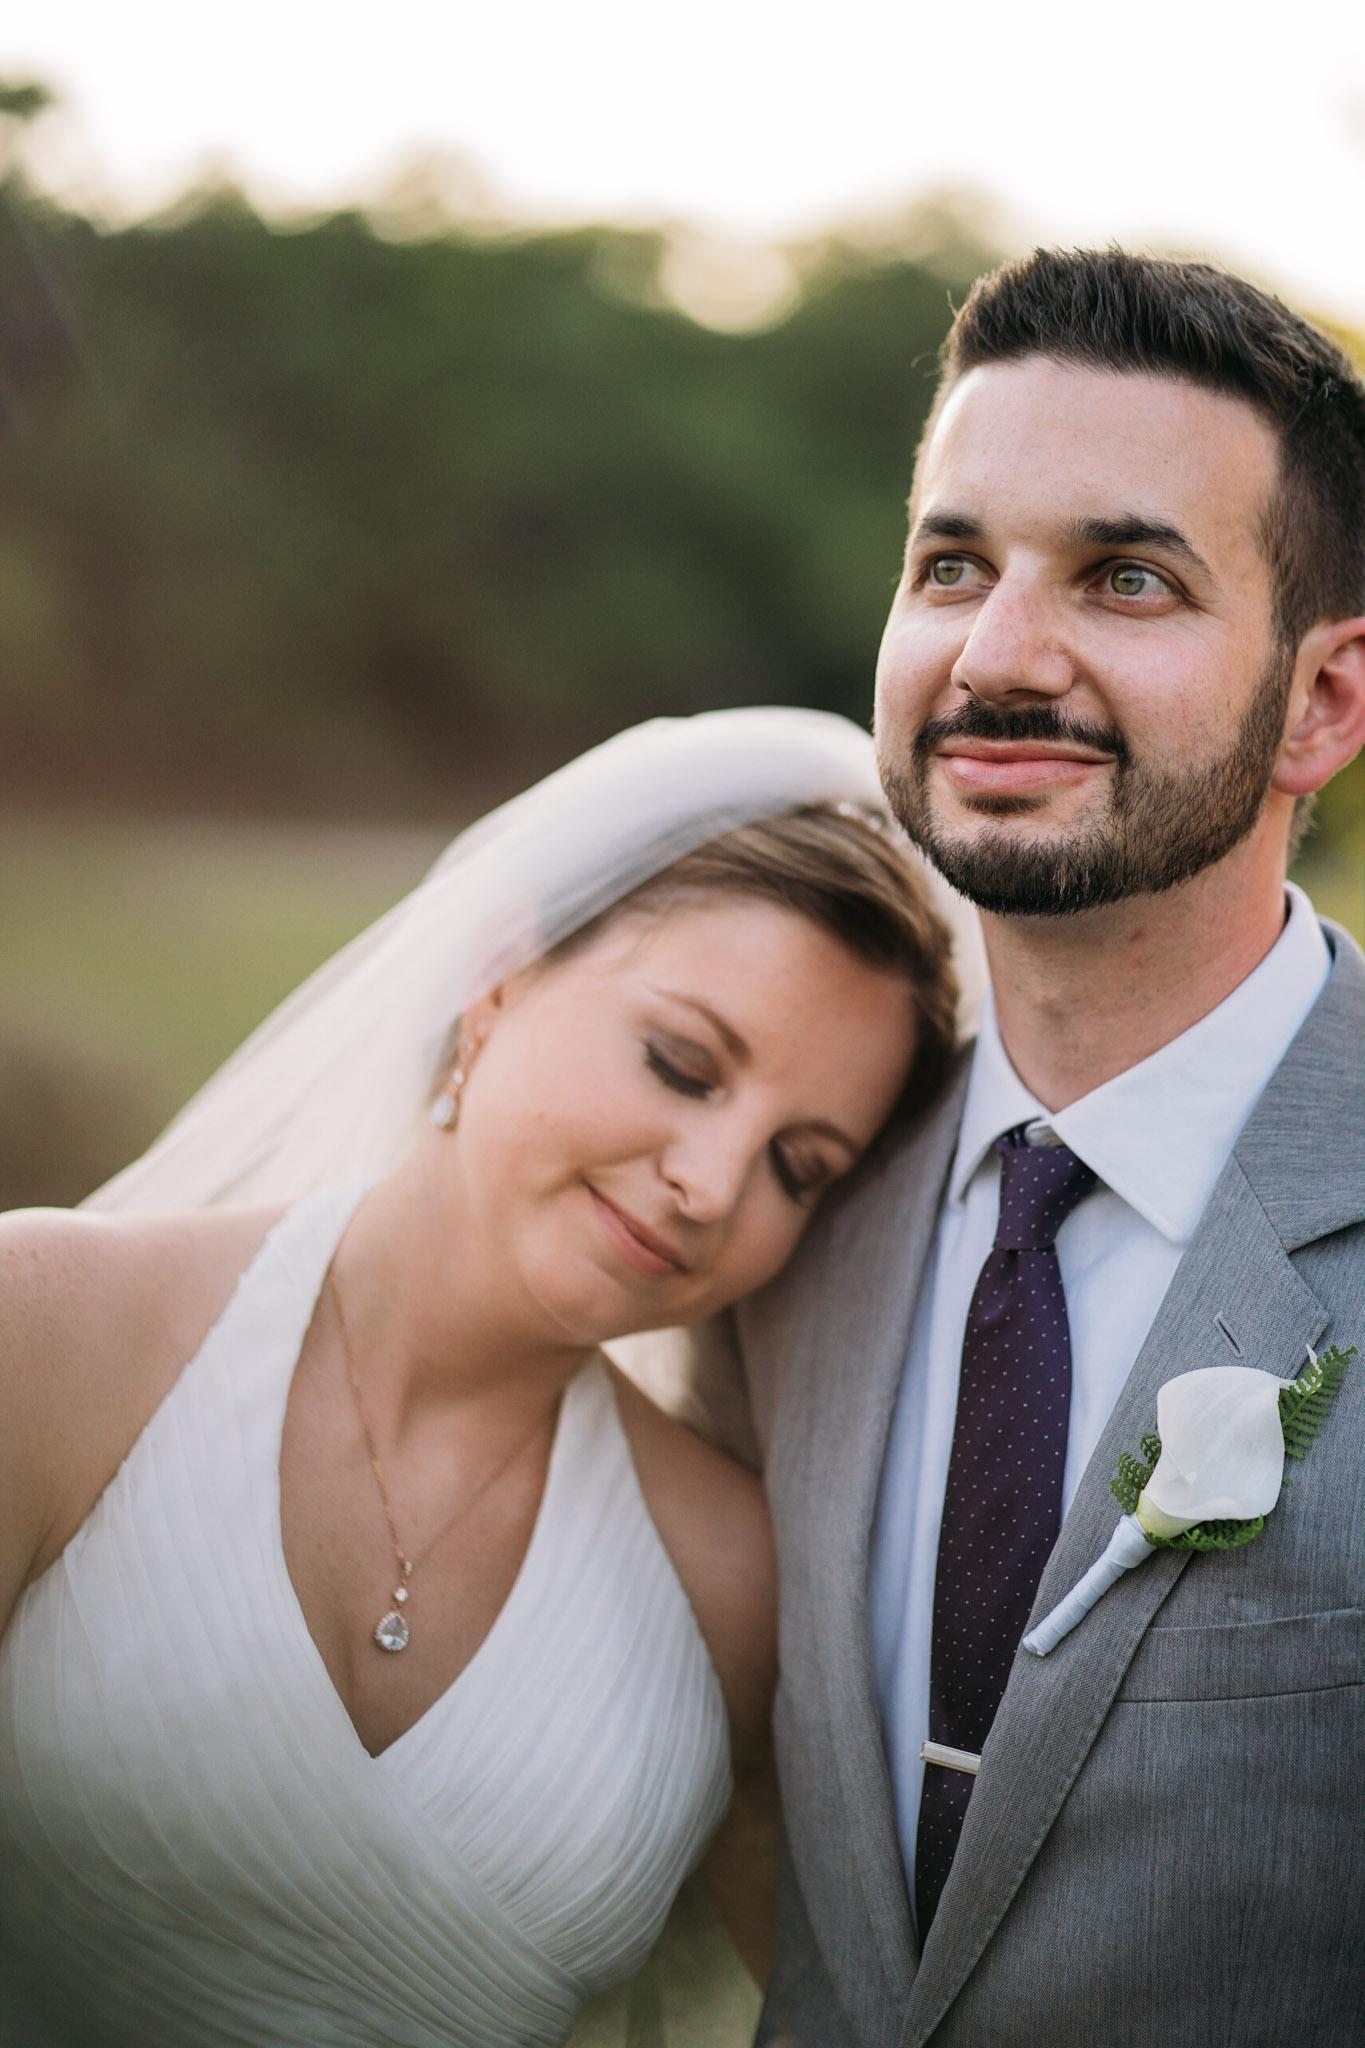 082518-Mandelkor-Wedding_AA98942.jpg